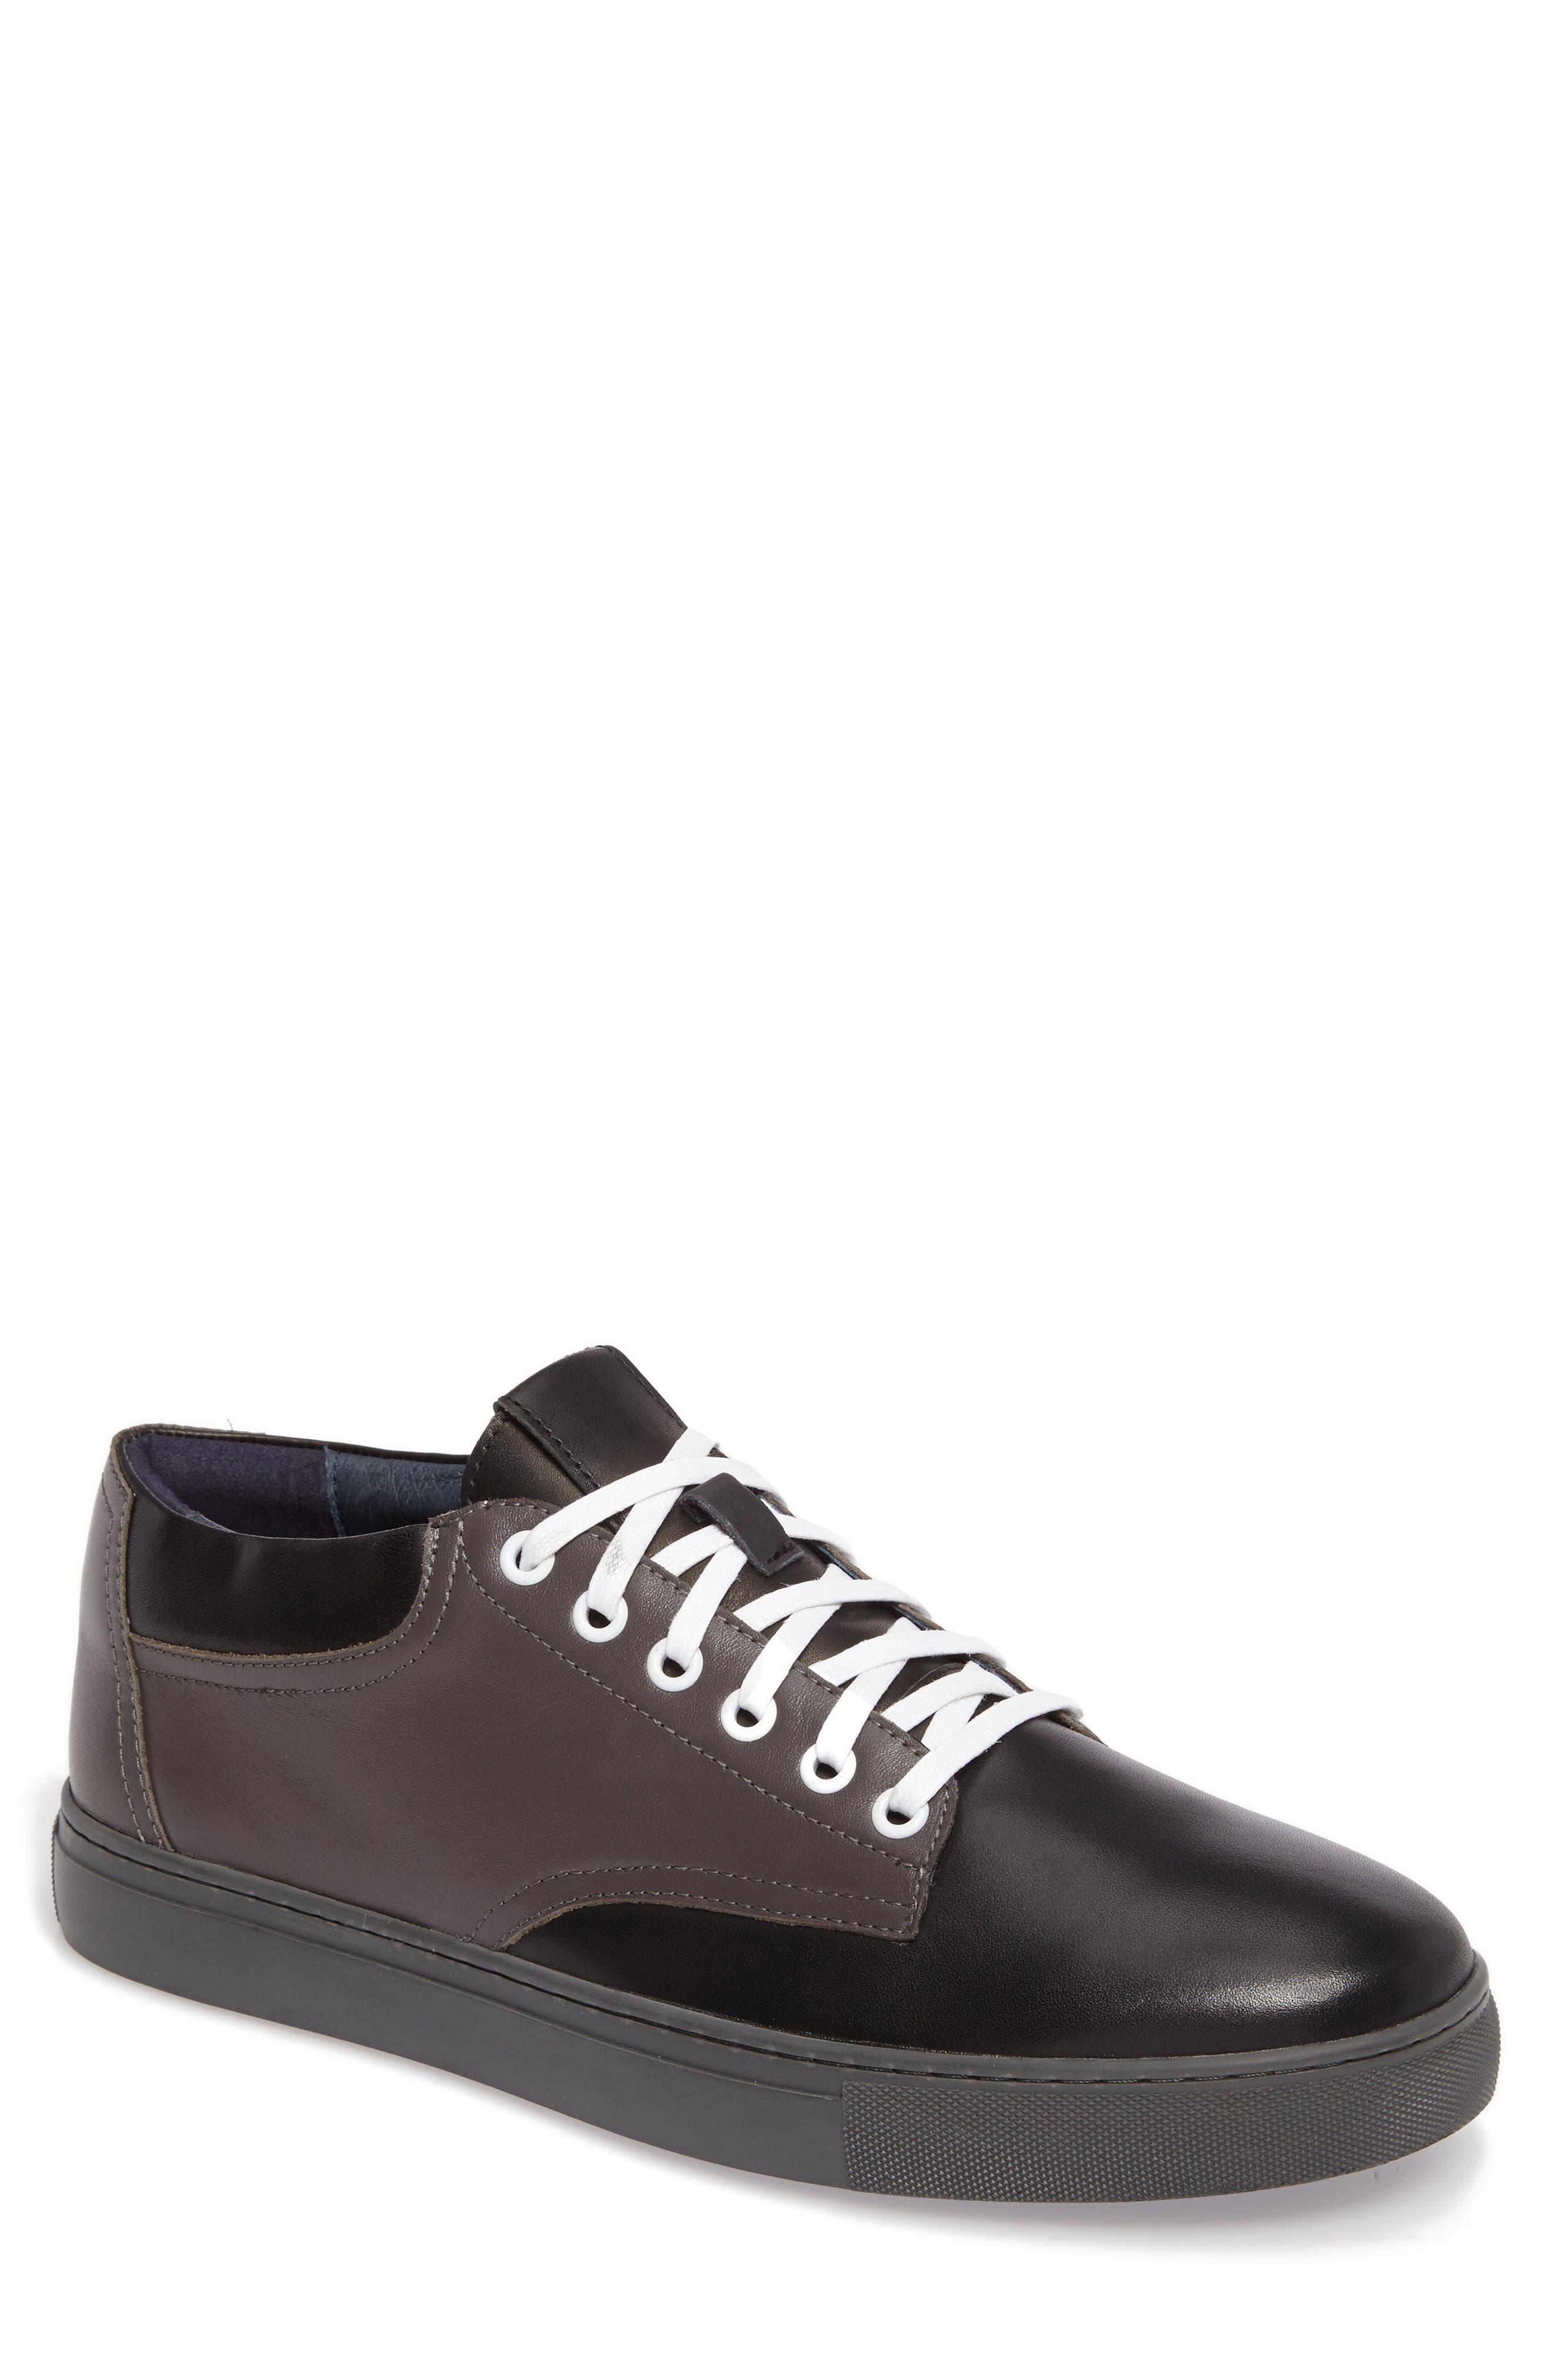 Ralston Sneaker,                         Main,                         color, 021